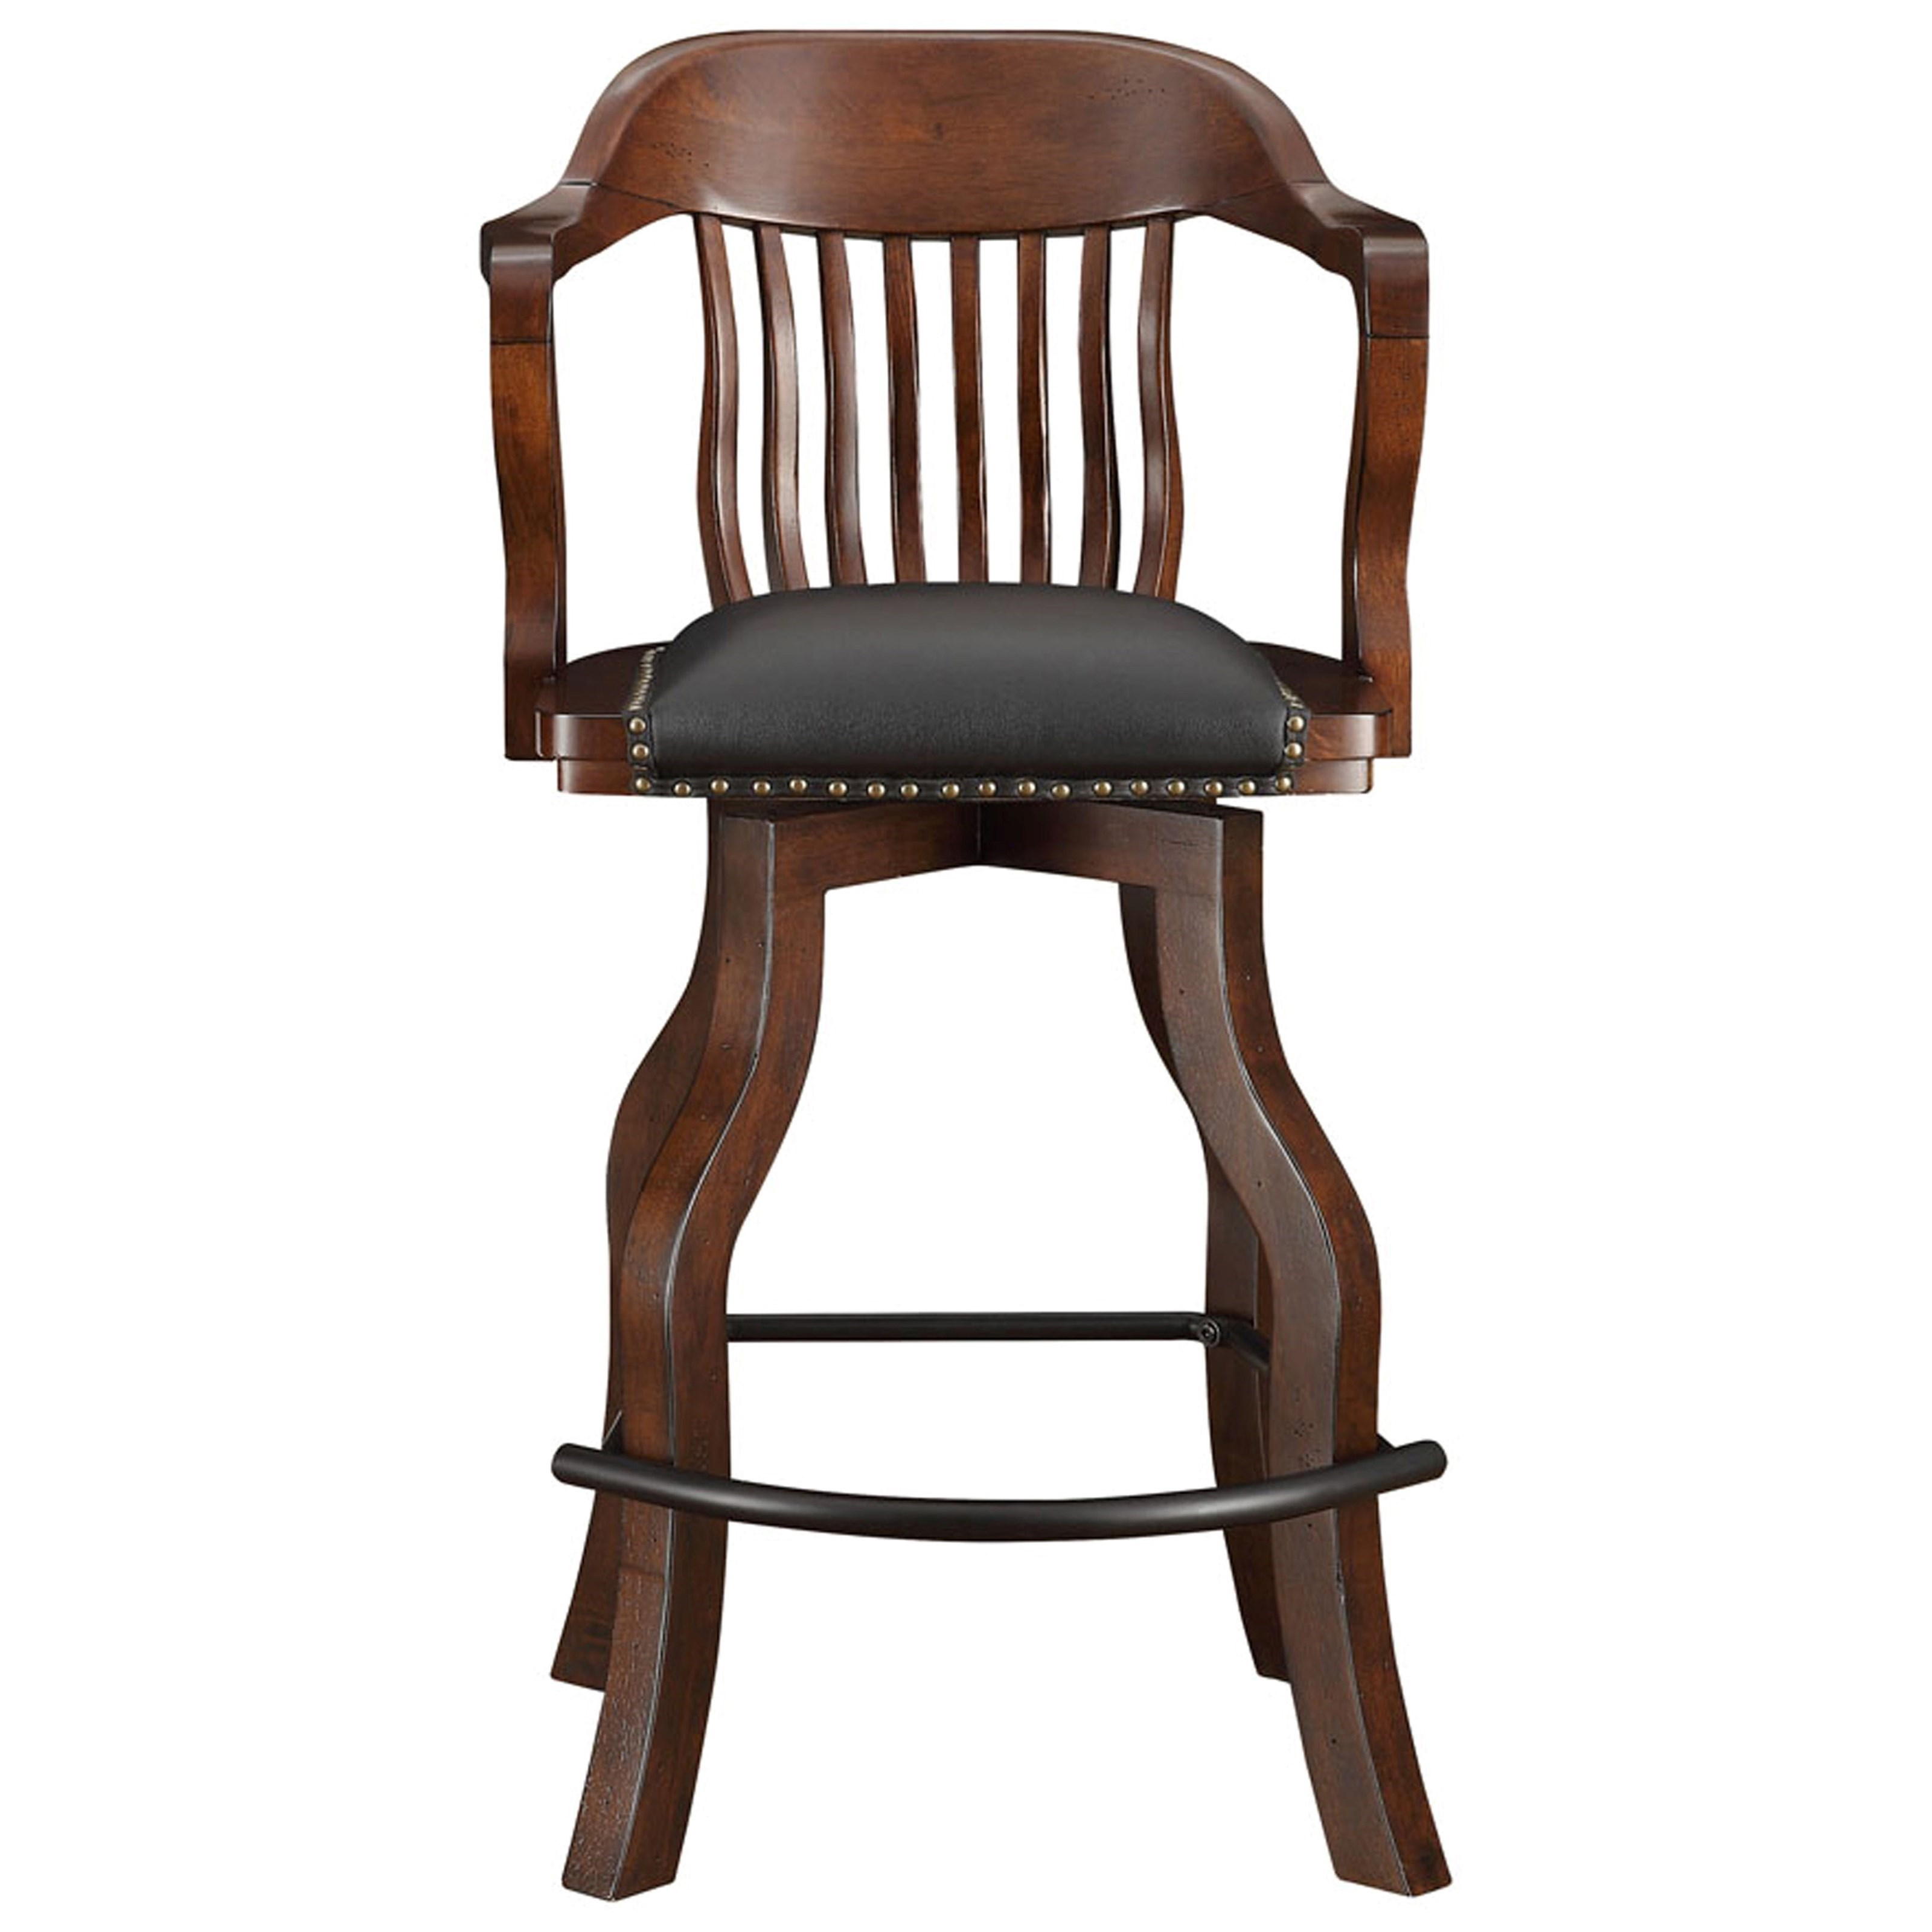 E C I Furniture Bar Stools 7045 35 Sbs Spectator Stool